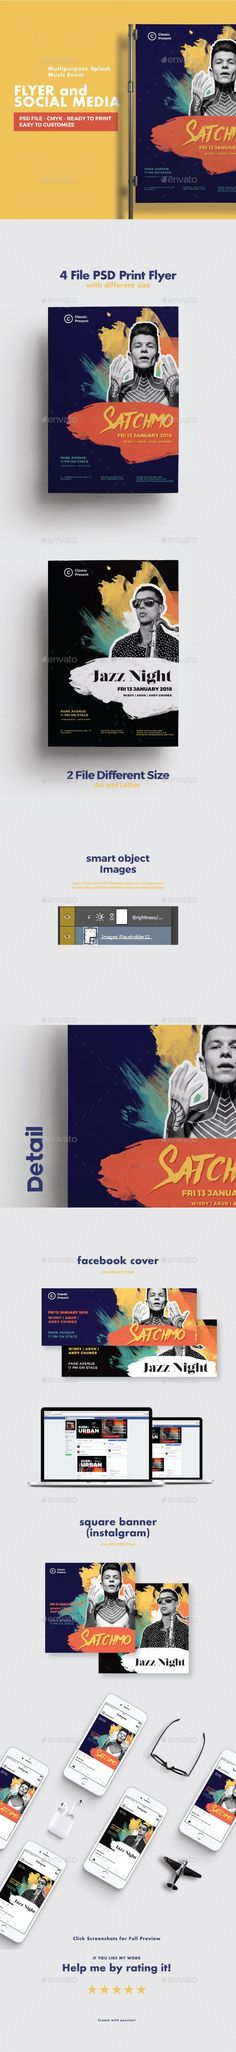 Multipurpose Splash Music Event Flyer and Social Media — Photoshop PSD #splash #simple • Available here ➝ https://graphicriver.net/item/multipurpose-splash-music-event-flyer-and-social-media/21050512?ref=pxcr